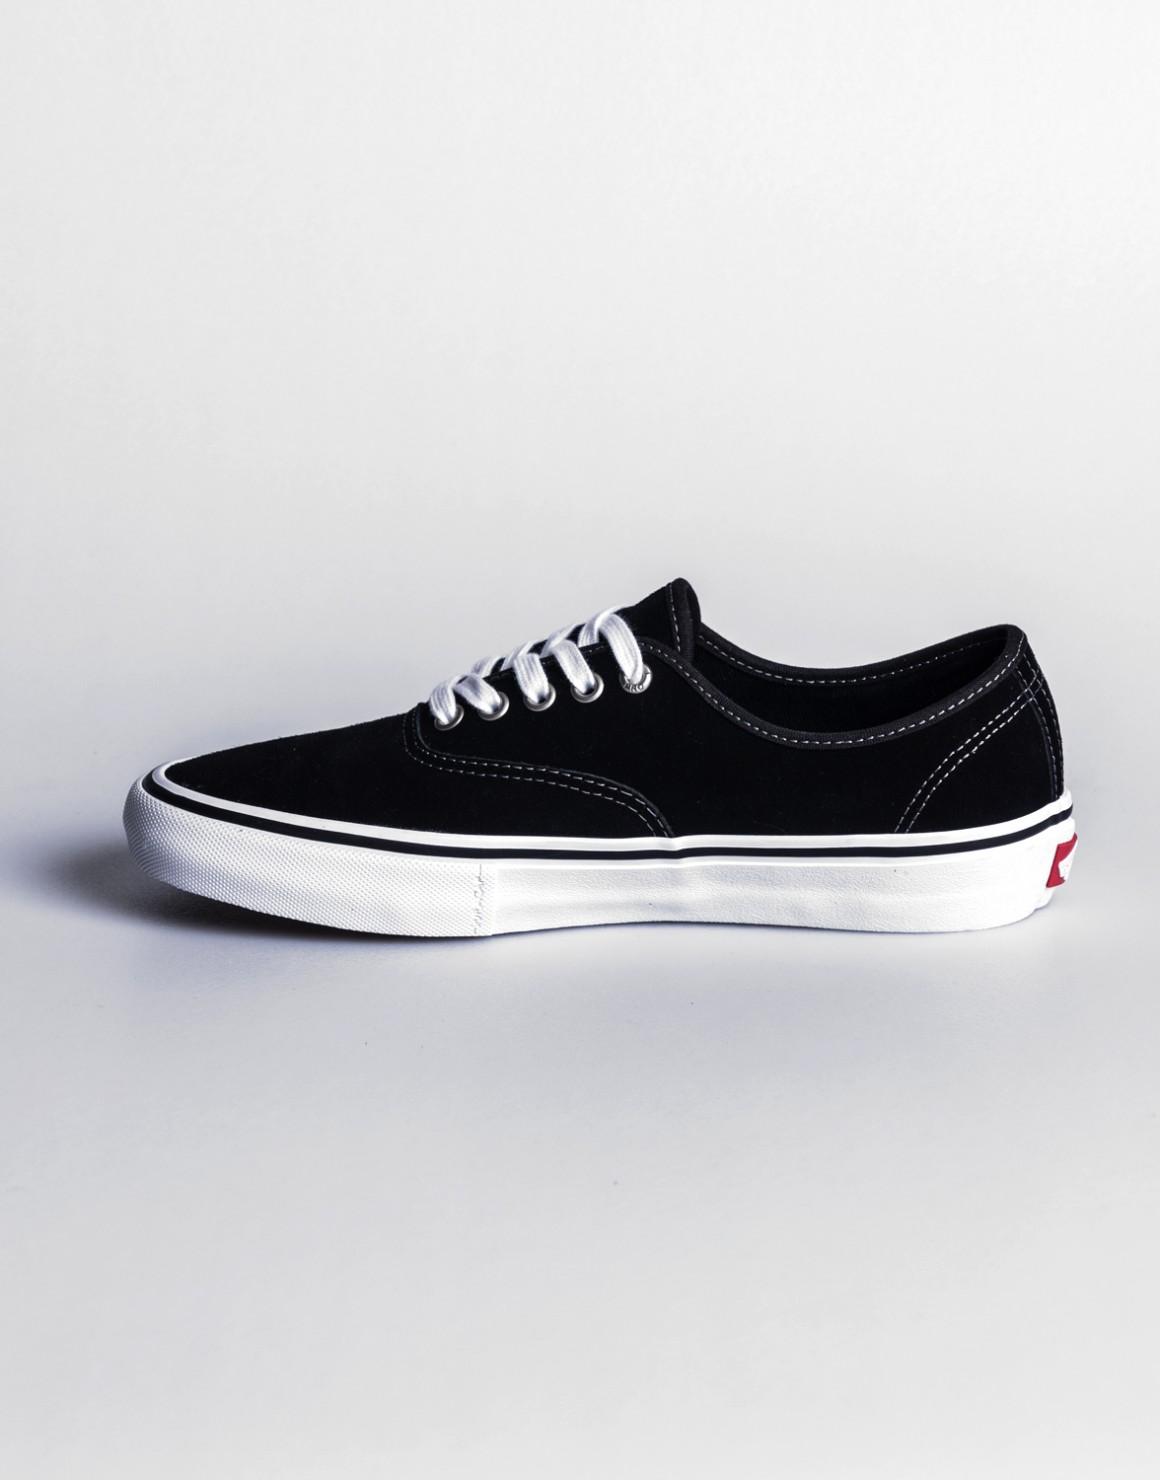 Vans Authentic Sneakers BlackWhite